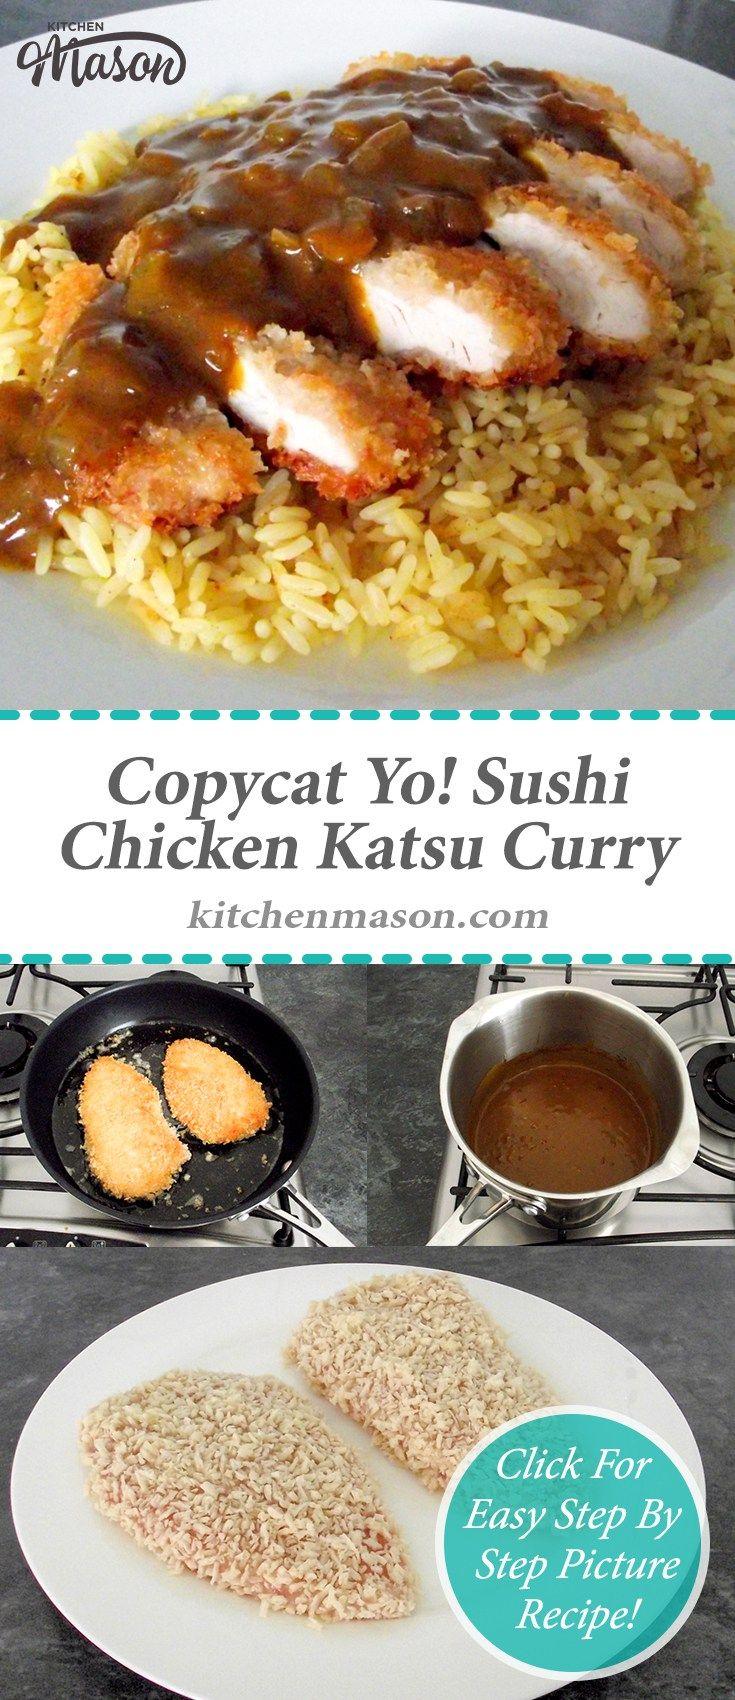 Chicken Katsu Curry | Copycat | Yo! Sushi | Japanese